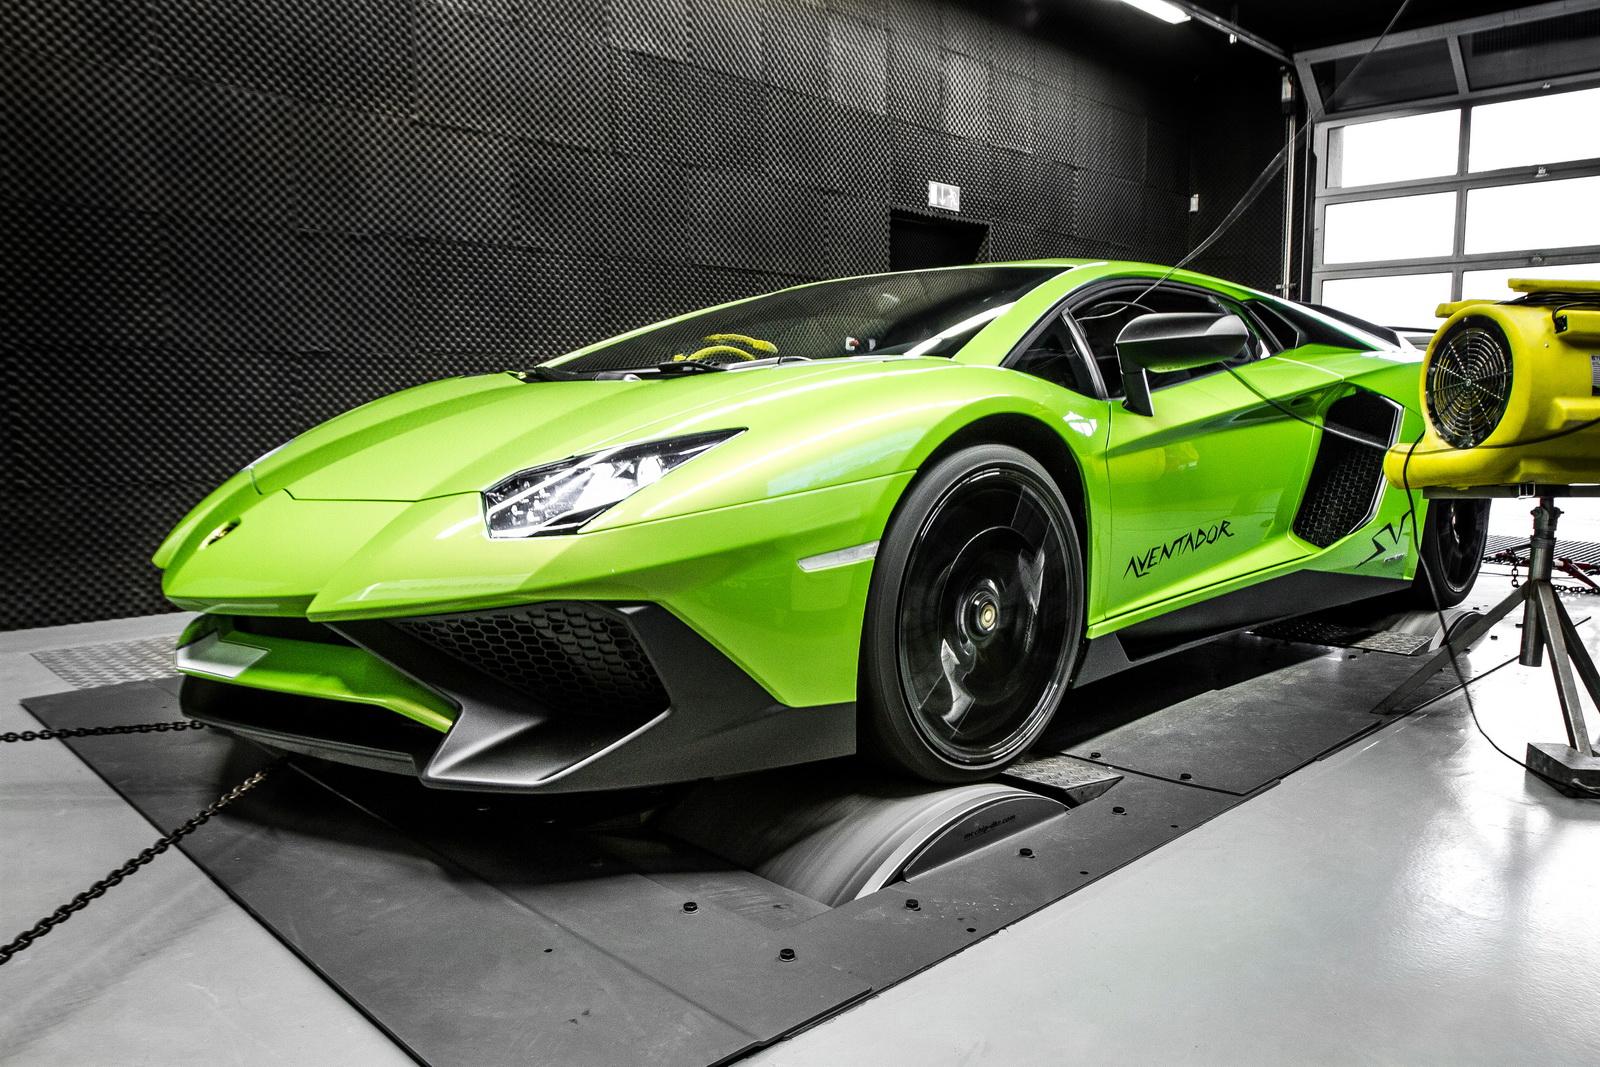 Lamborghini_Aventador_SV_by_Mcchip-DKR_18